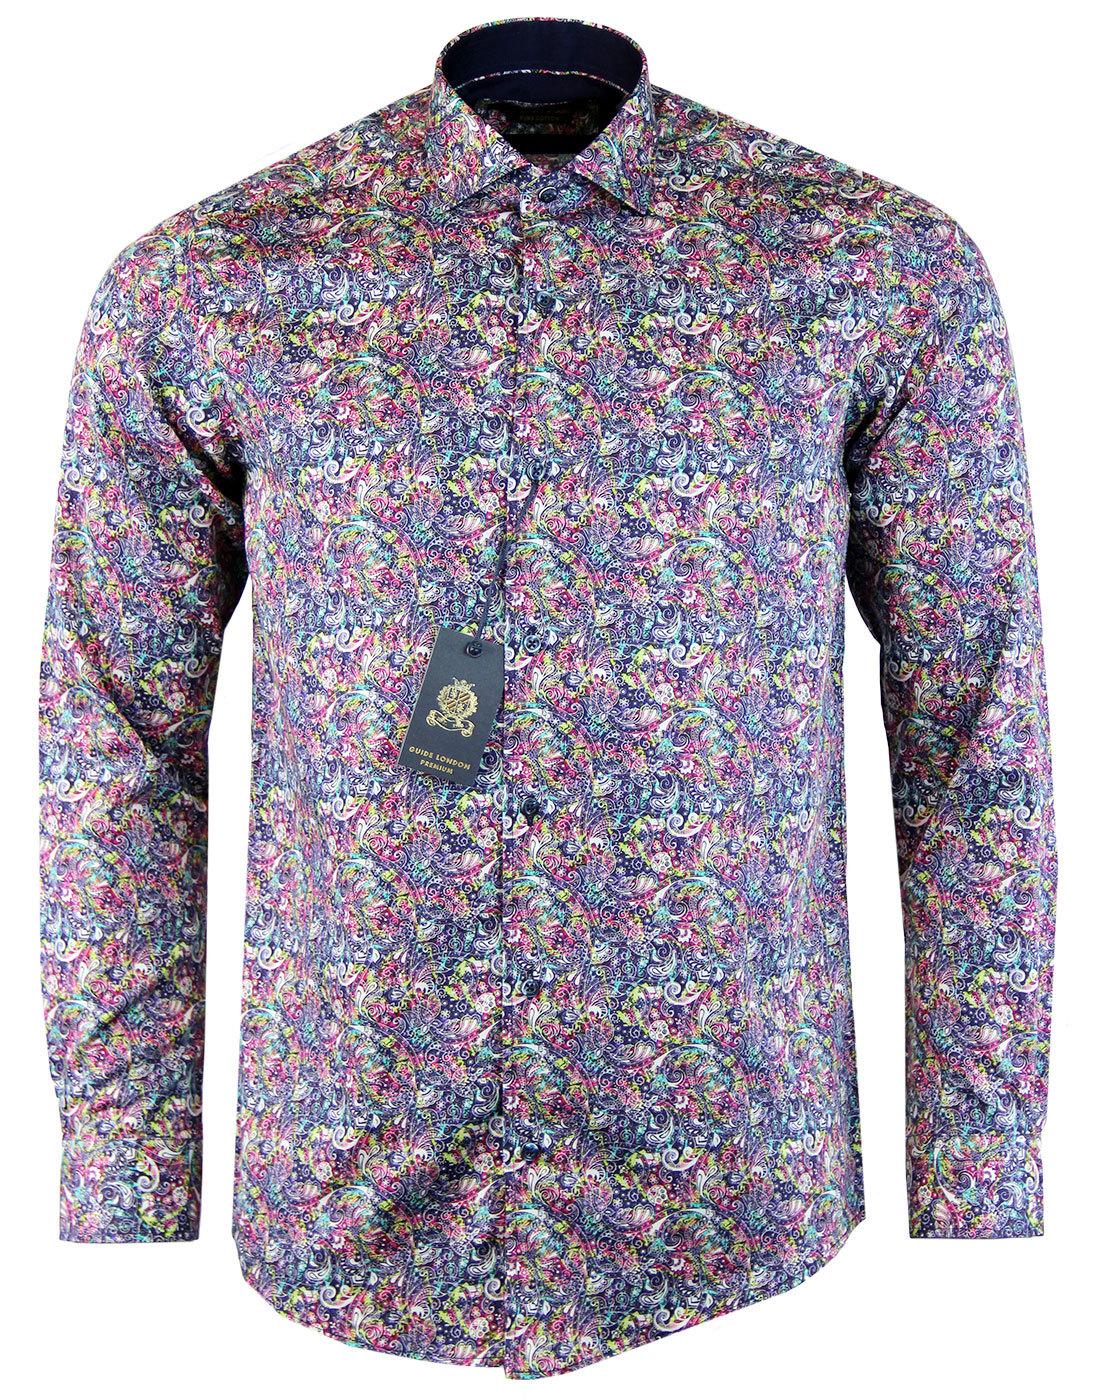 GUIDE LONDON Neon Paisley Retro 60s Mod Shirt